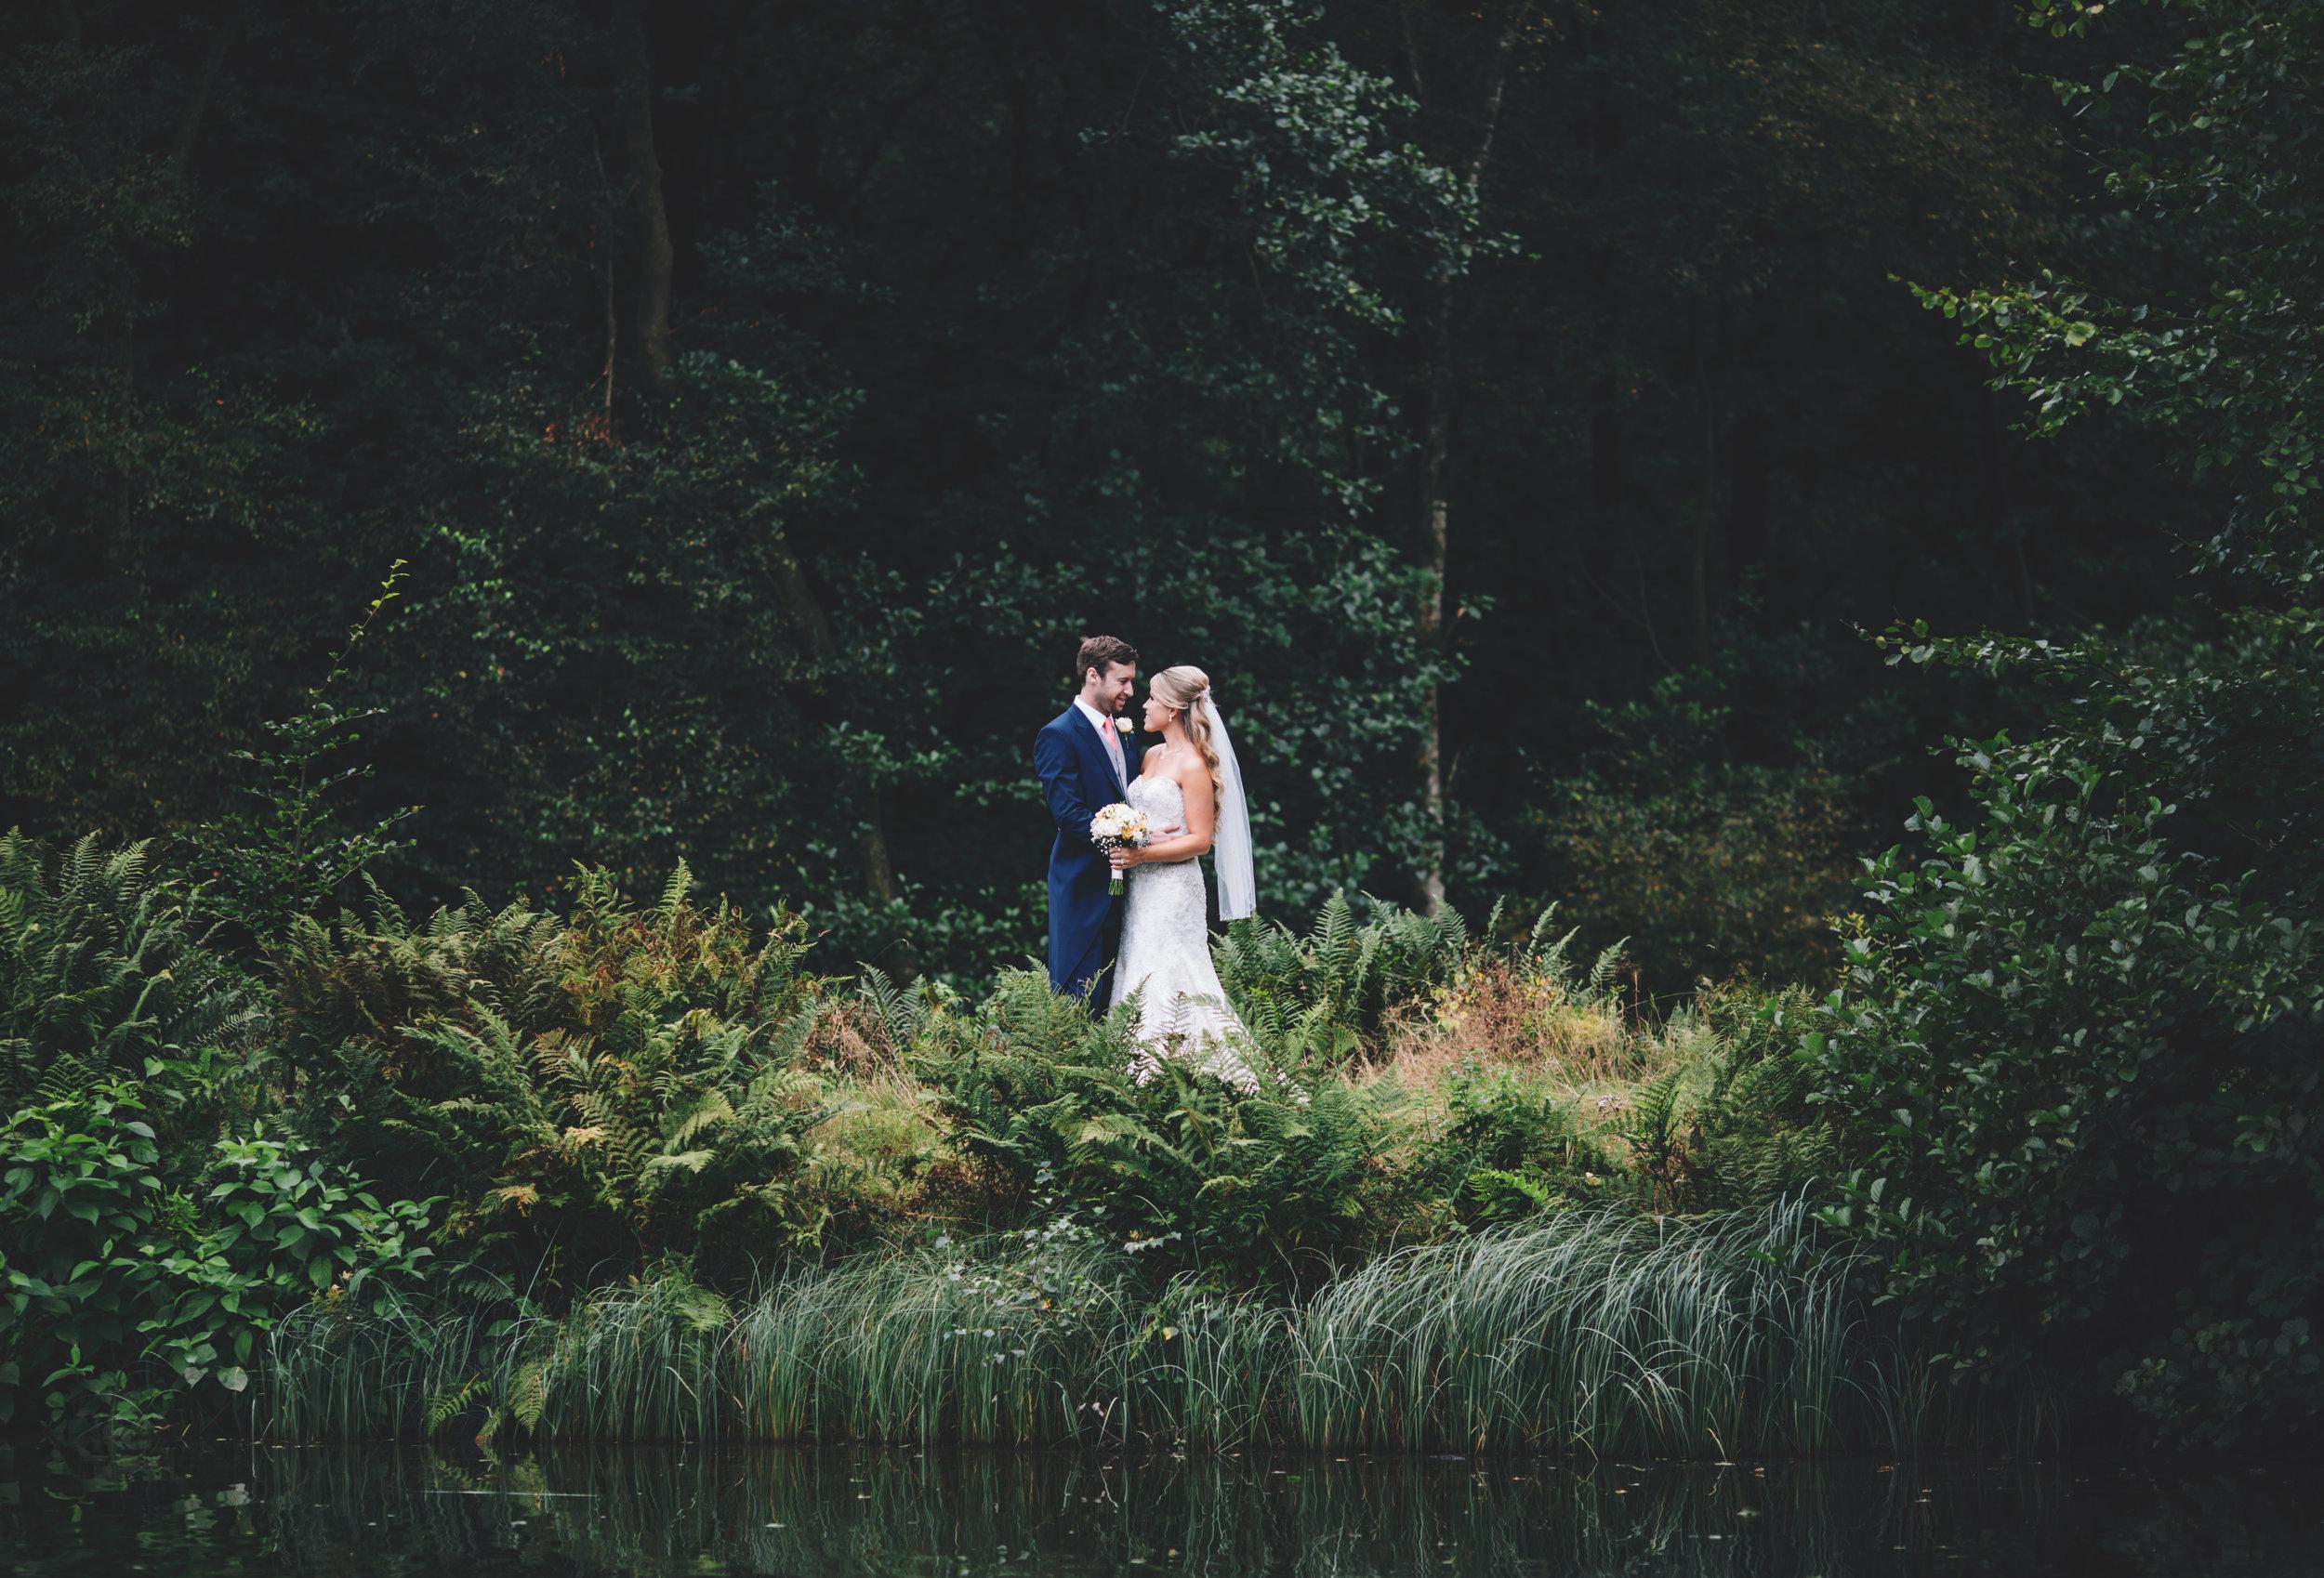 stunning lake scenery at Browsholme Hall wedding